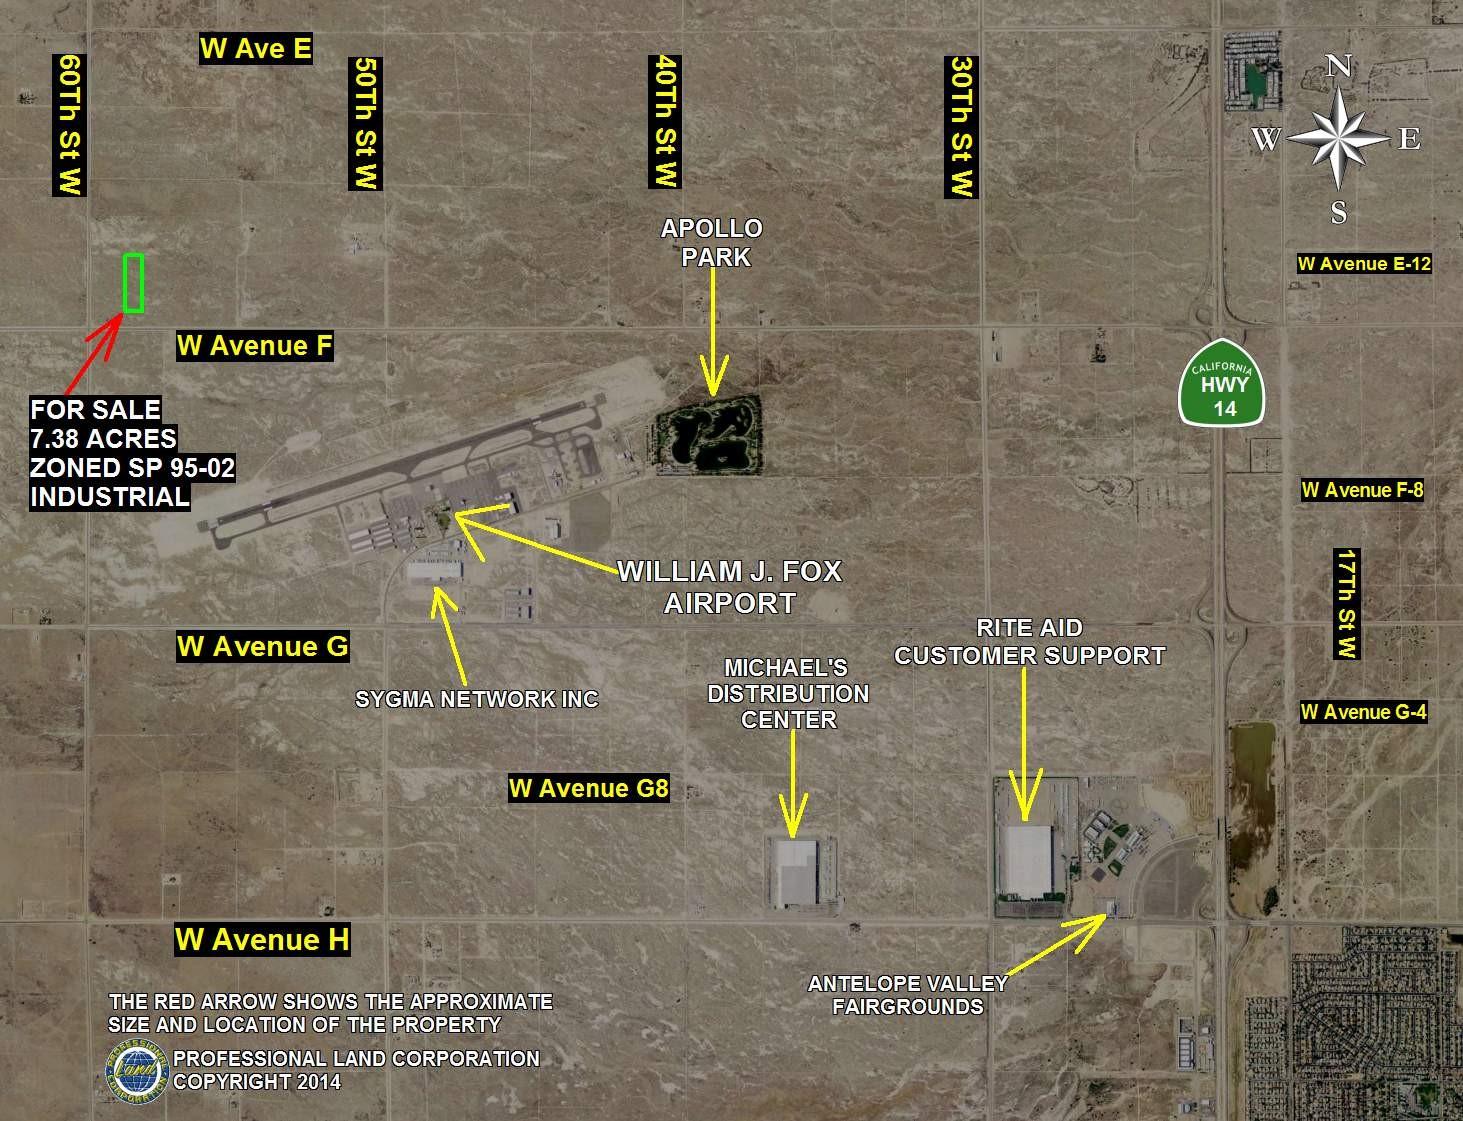 Antelope Valley Professional Land Corporation